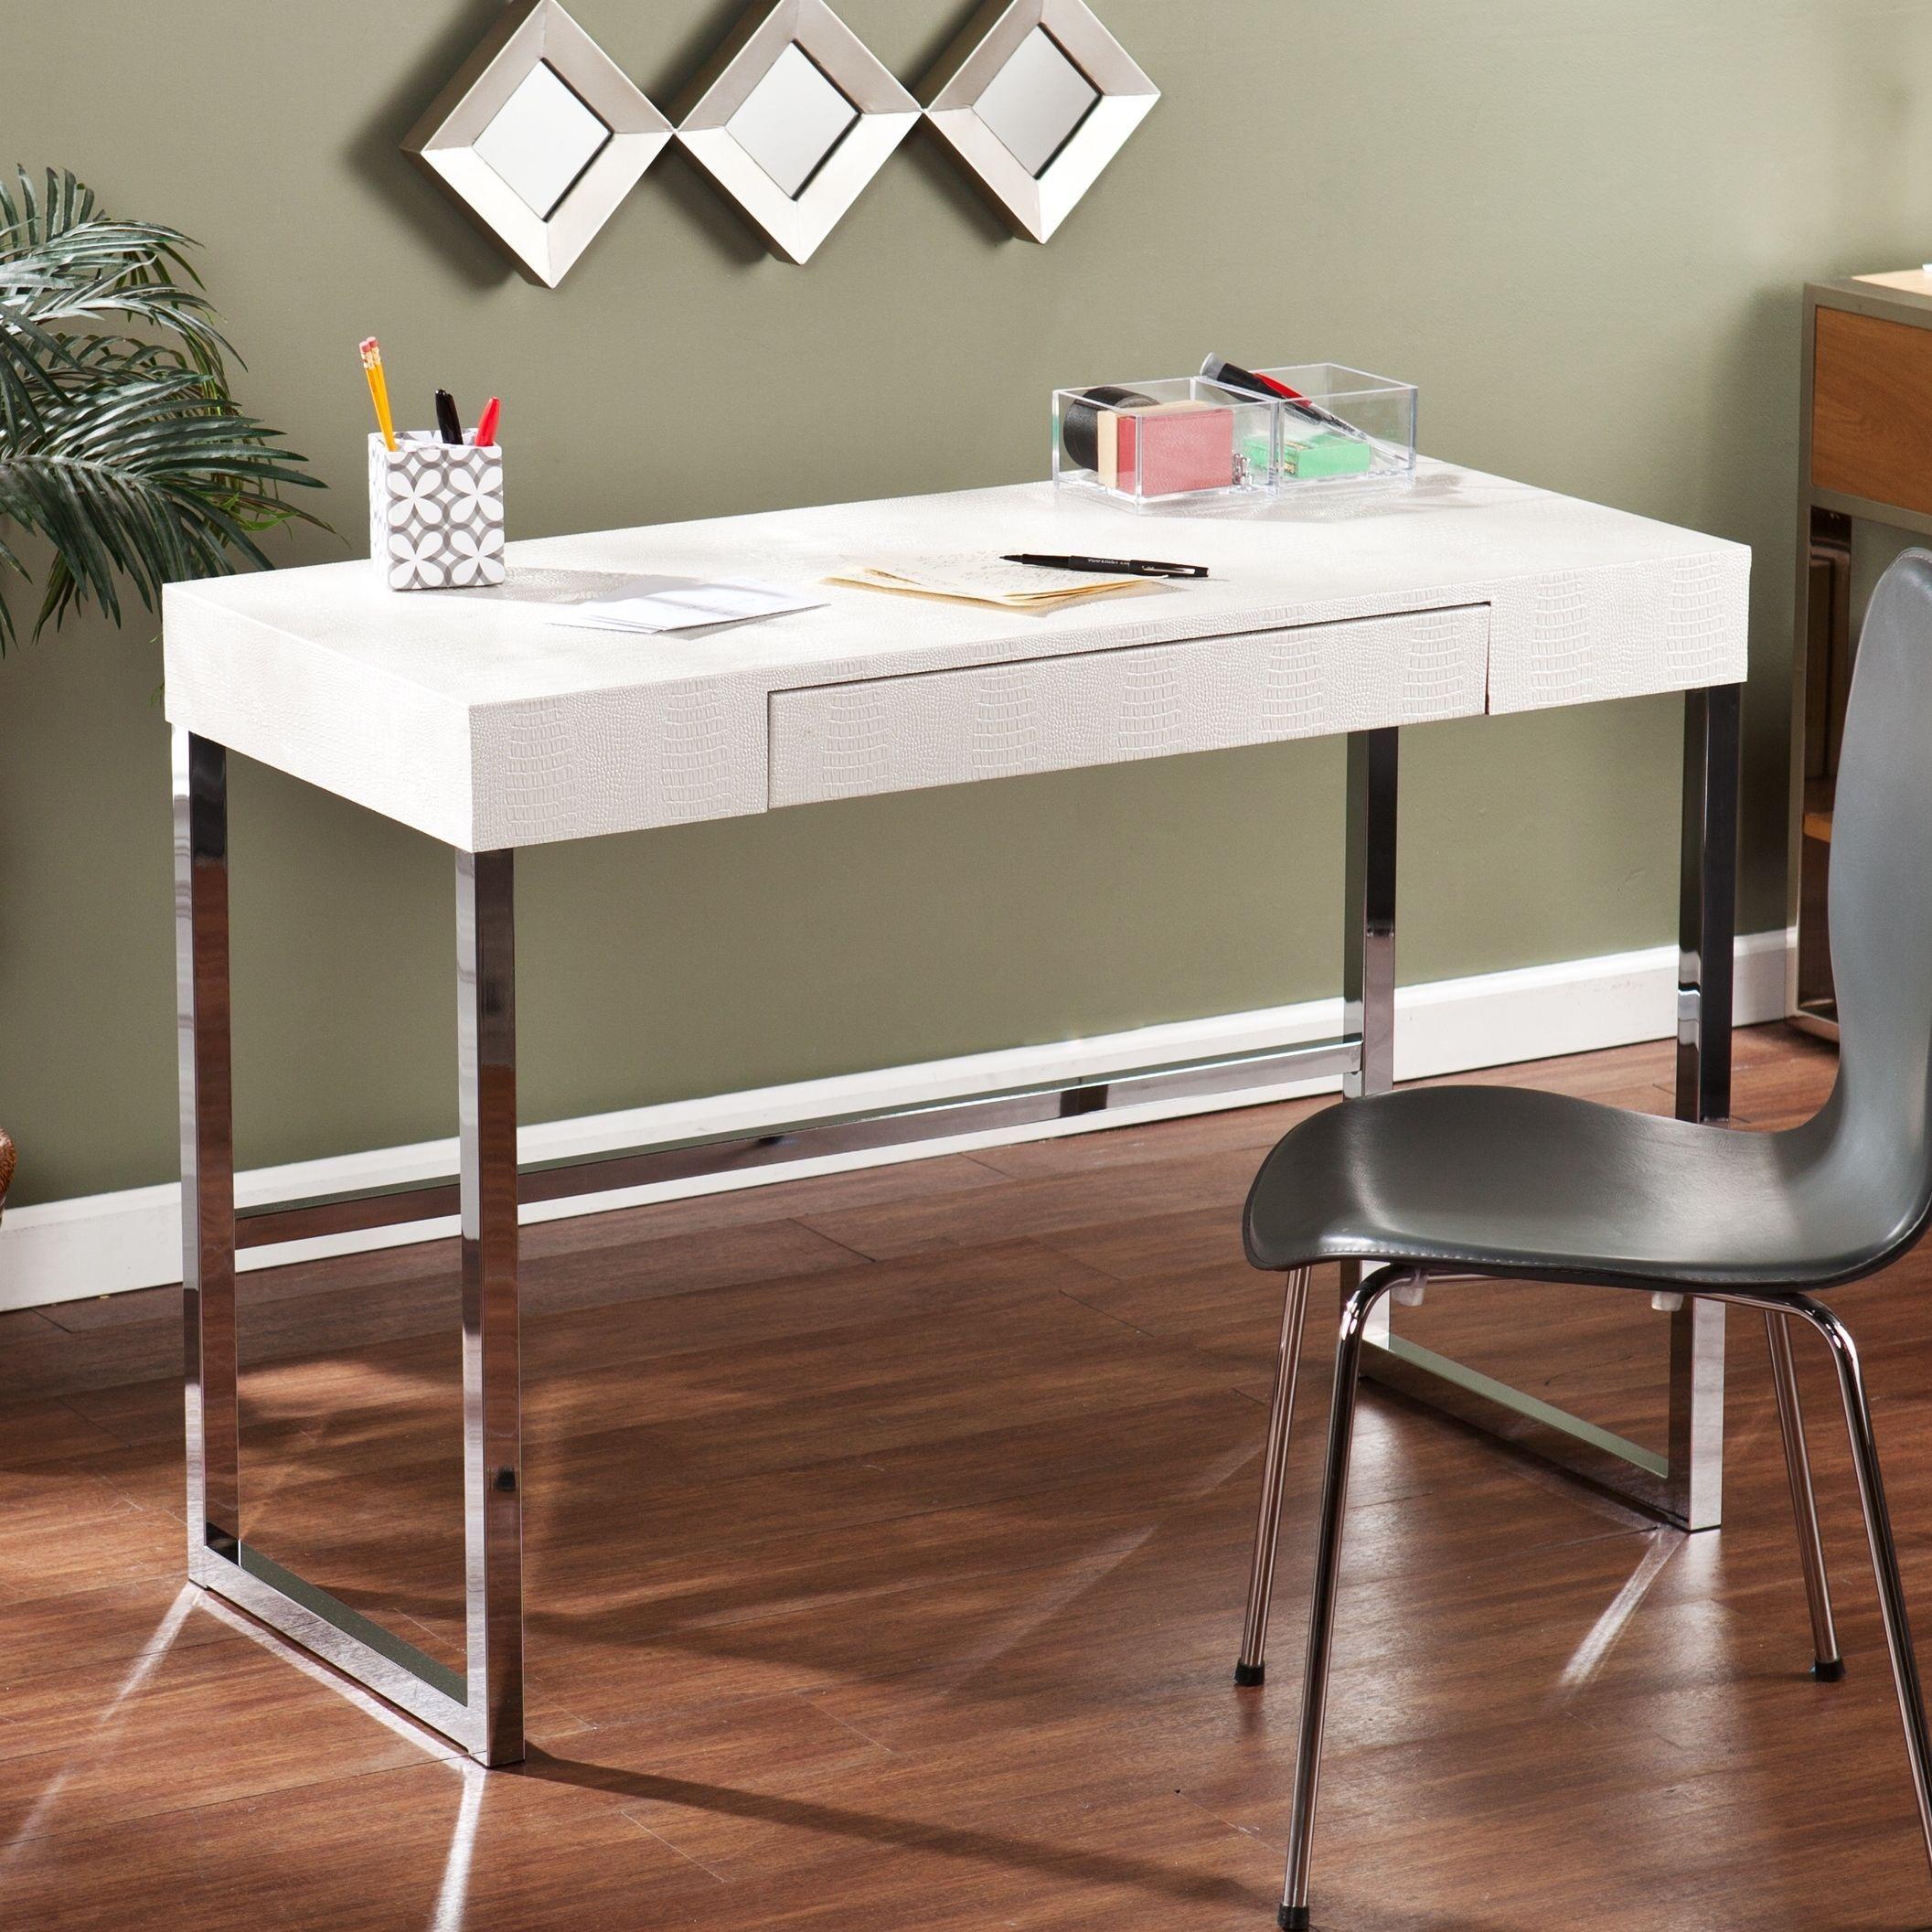 Oliver James Alceo Textured White Desk Contemporary Desk